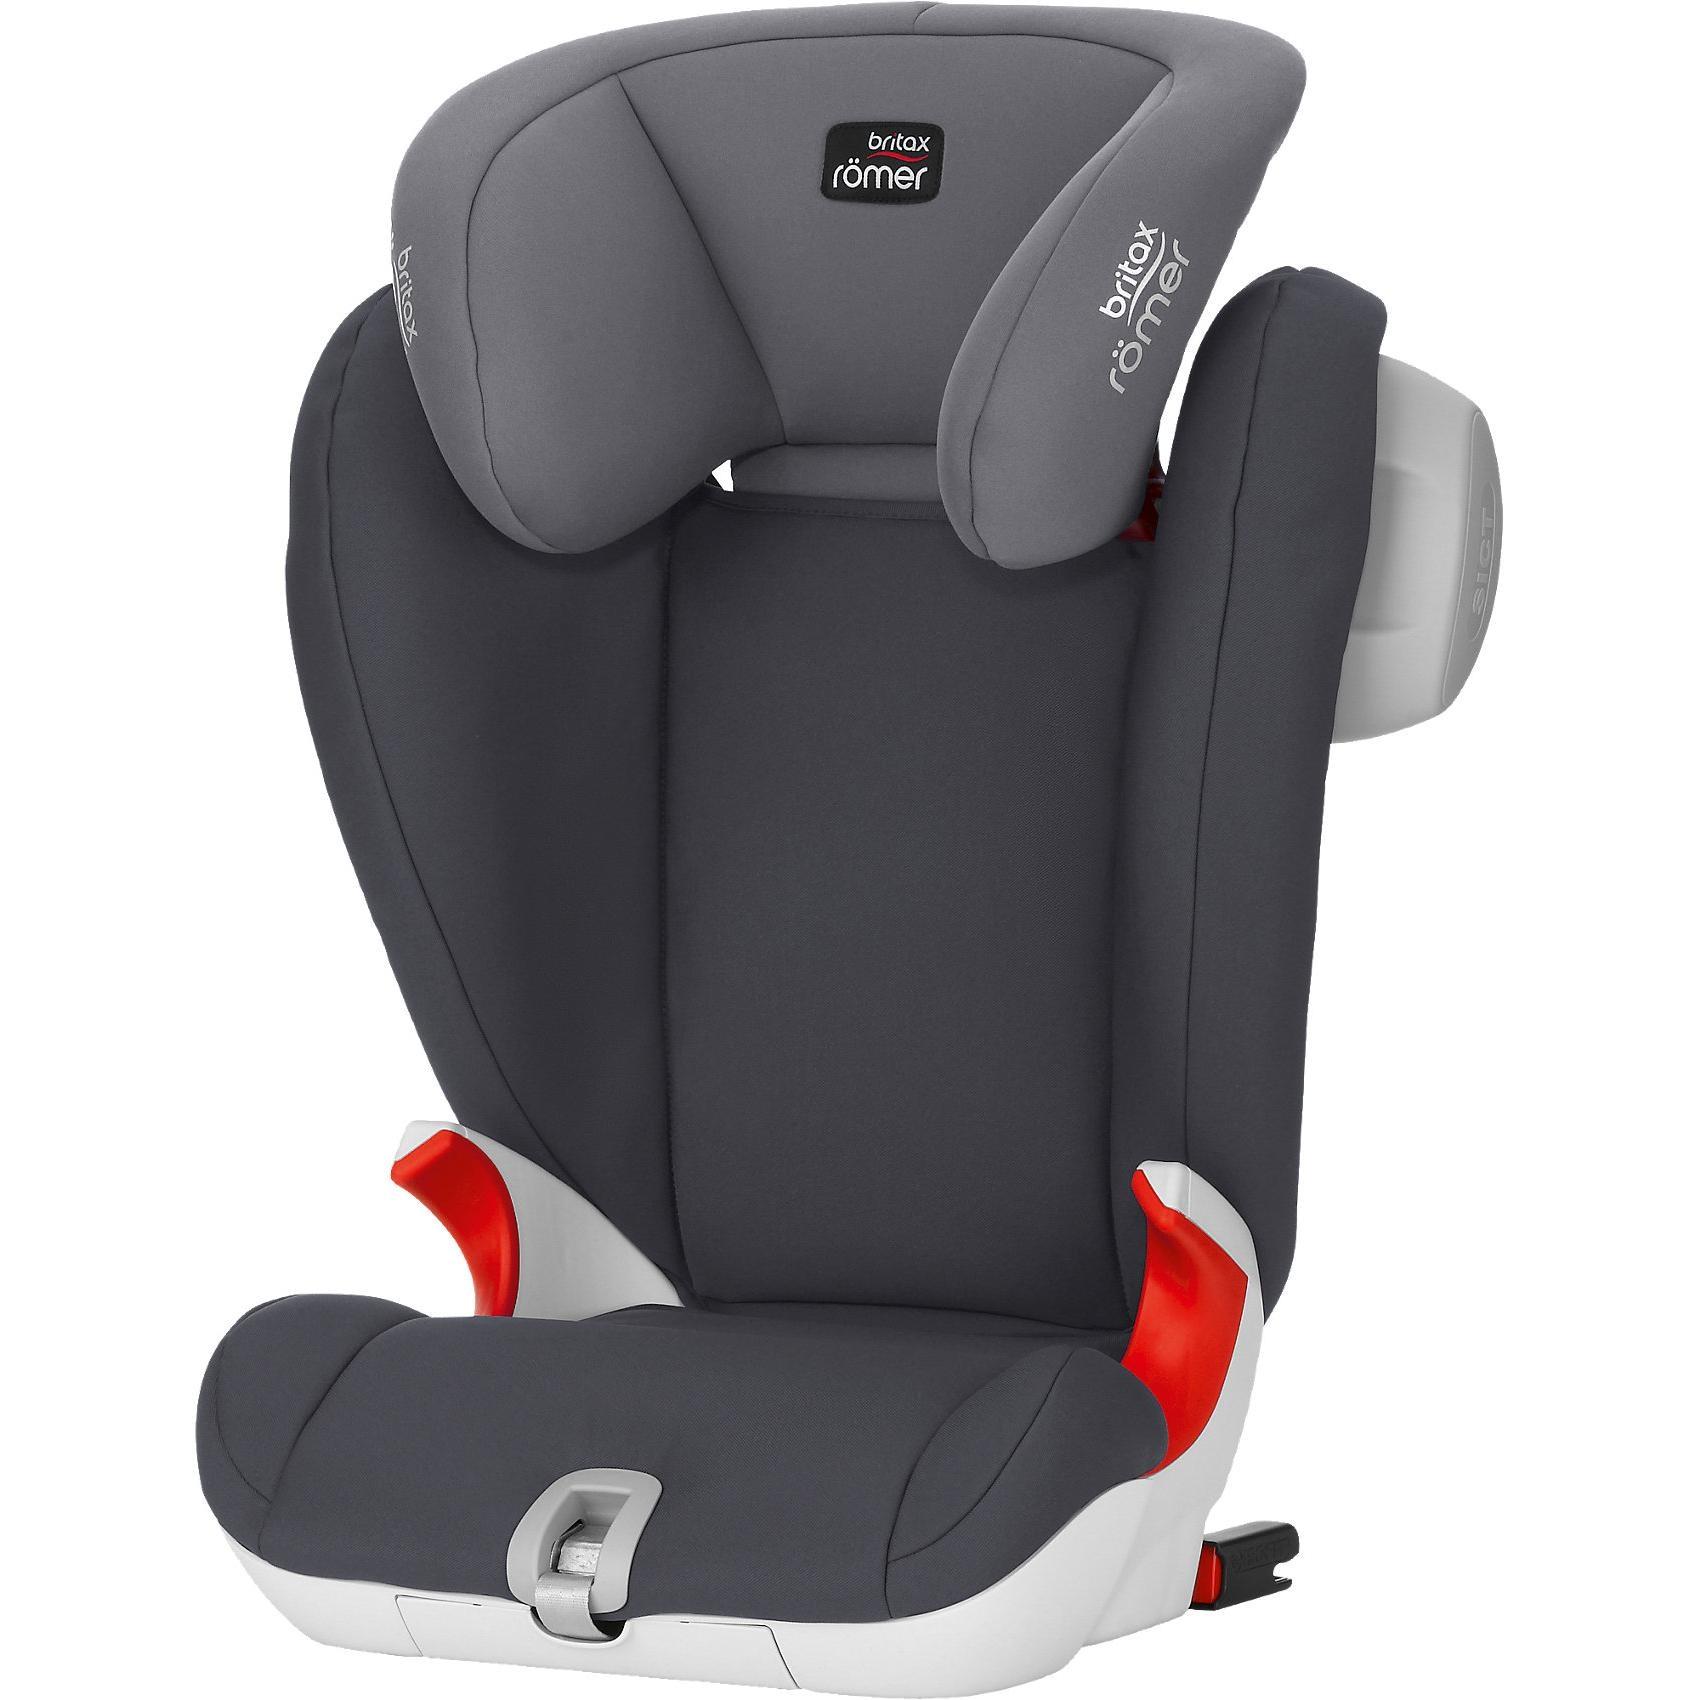 Britax Römer Auto-Kindersitz Kidfix SL SICT Storm Grey 2018